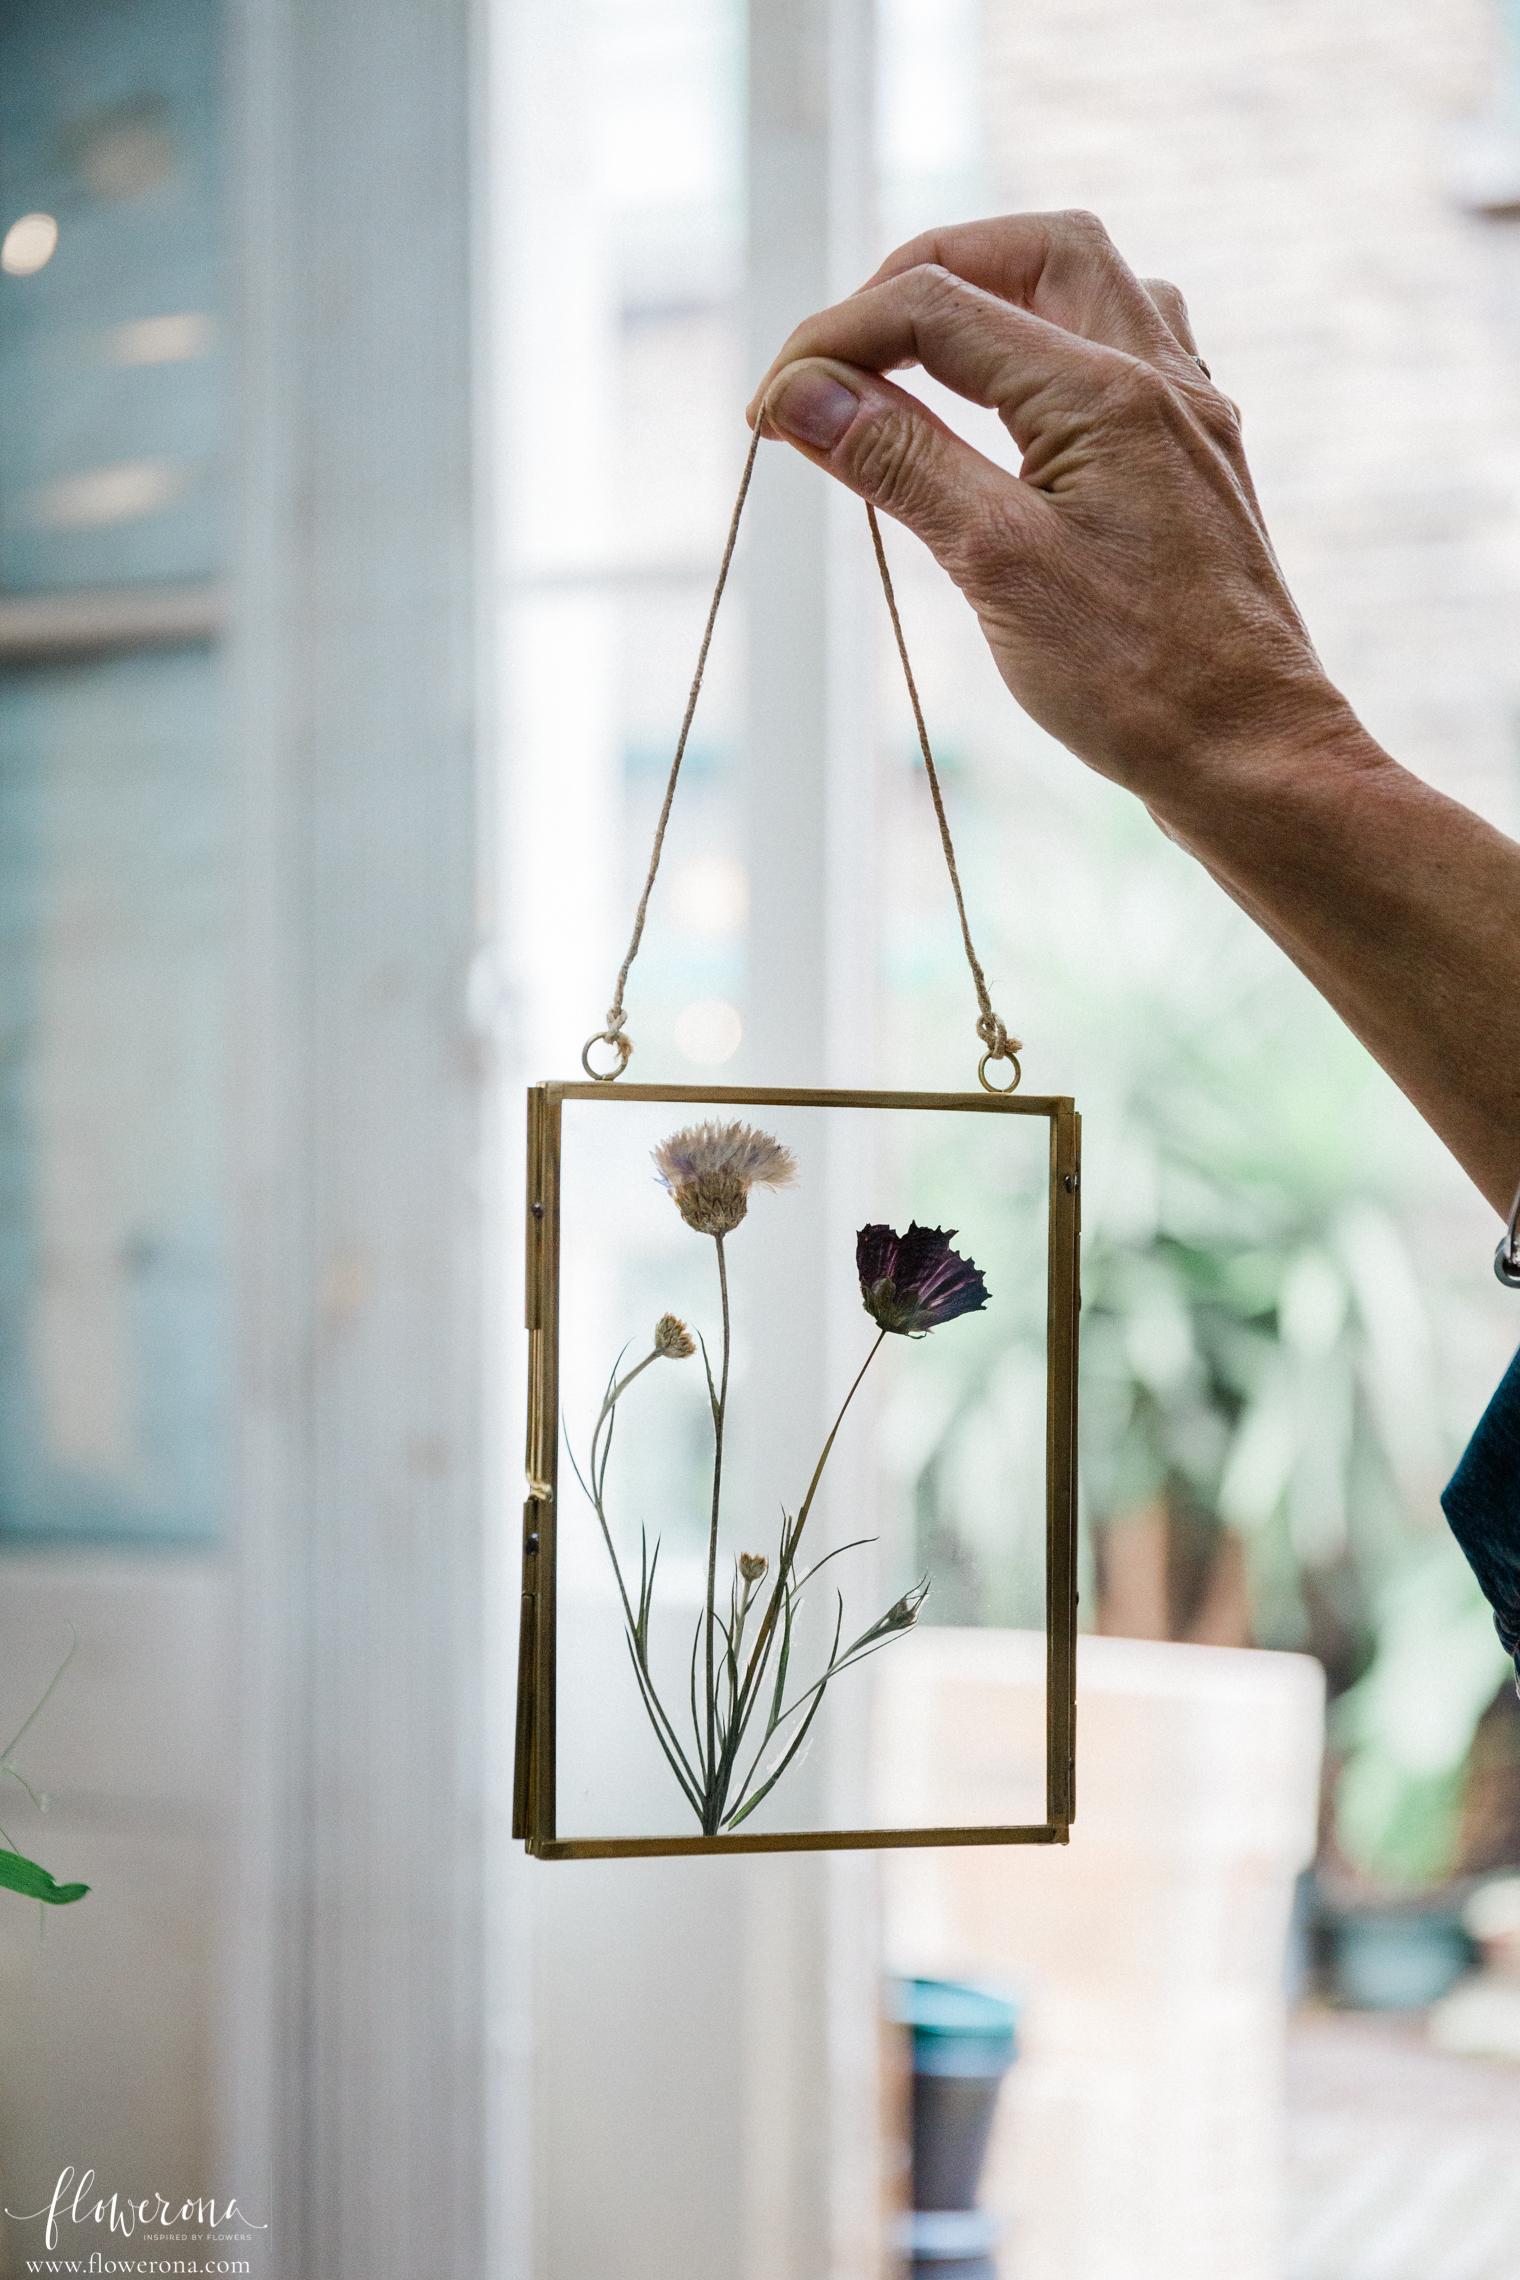 Pressed Flowers in Frame